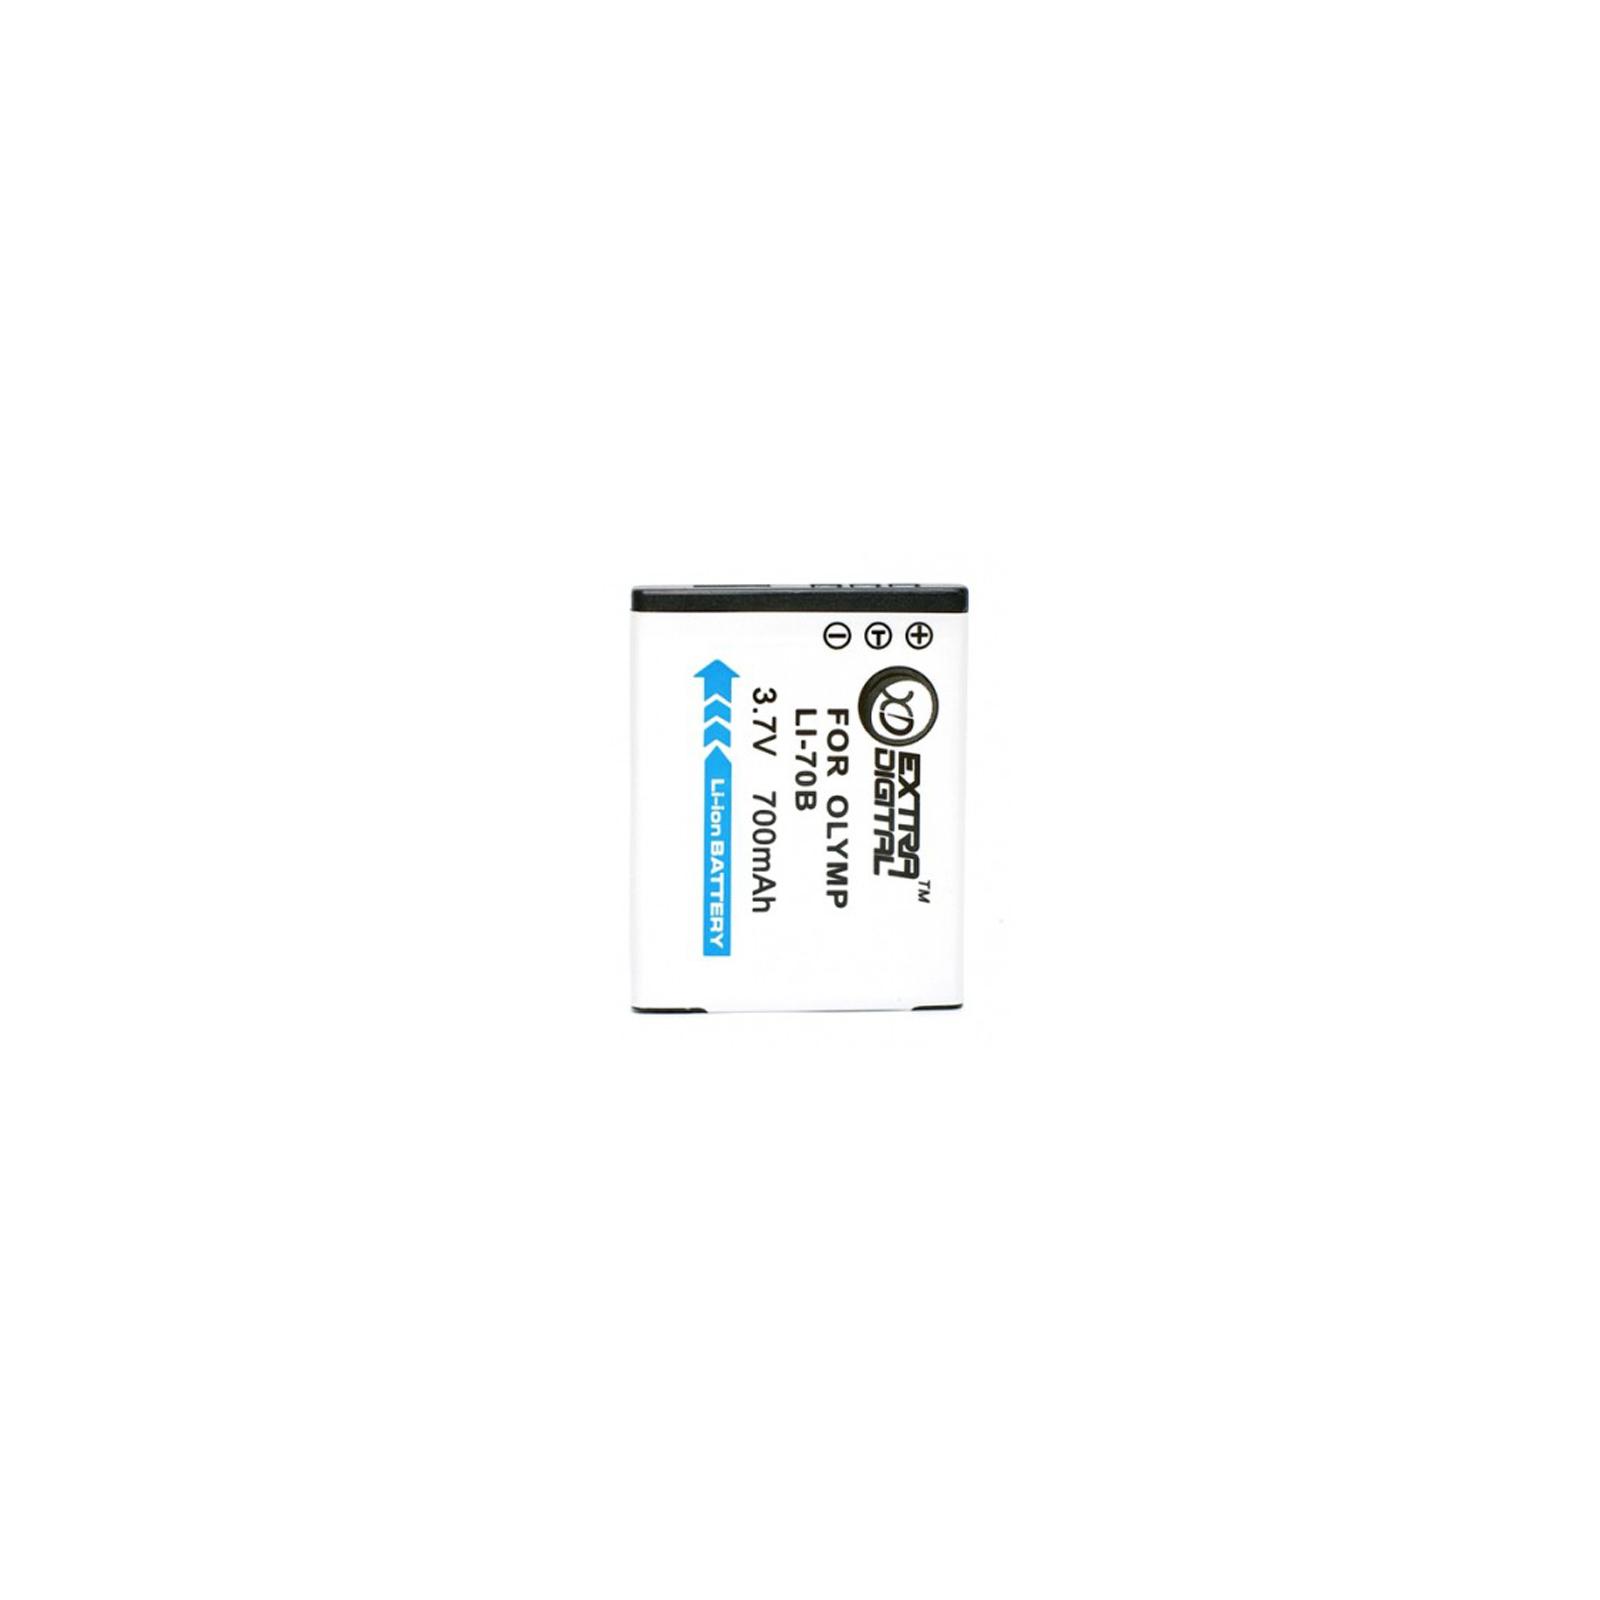 Аккумулятор к фото/видео EXTRADIGITAL Olympus LI-70B (BDO2541)